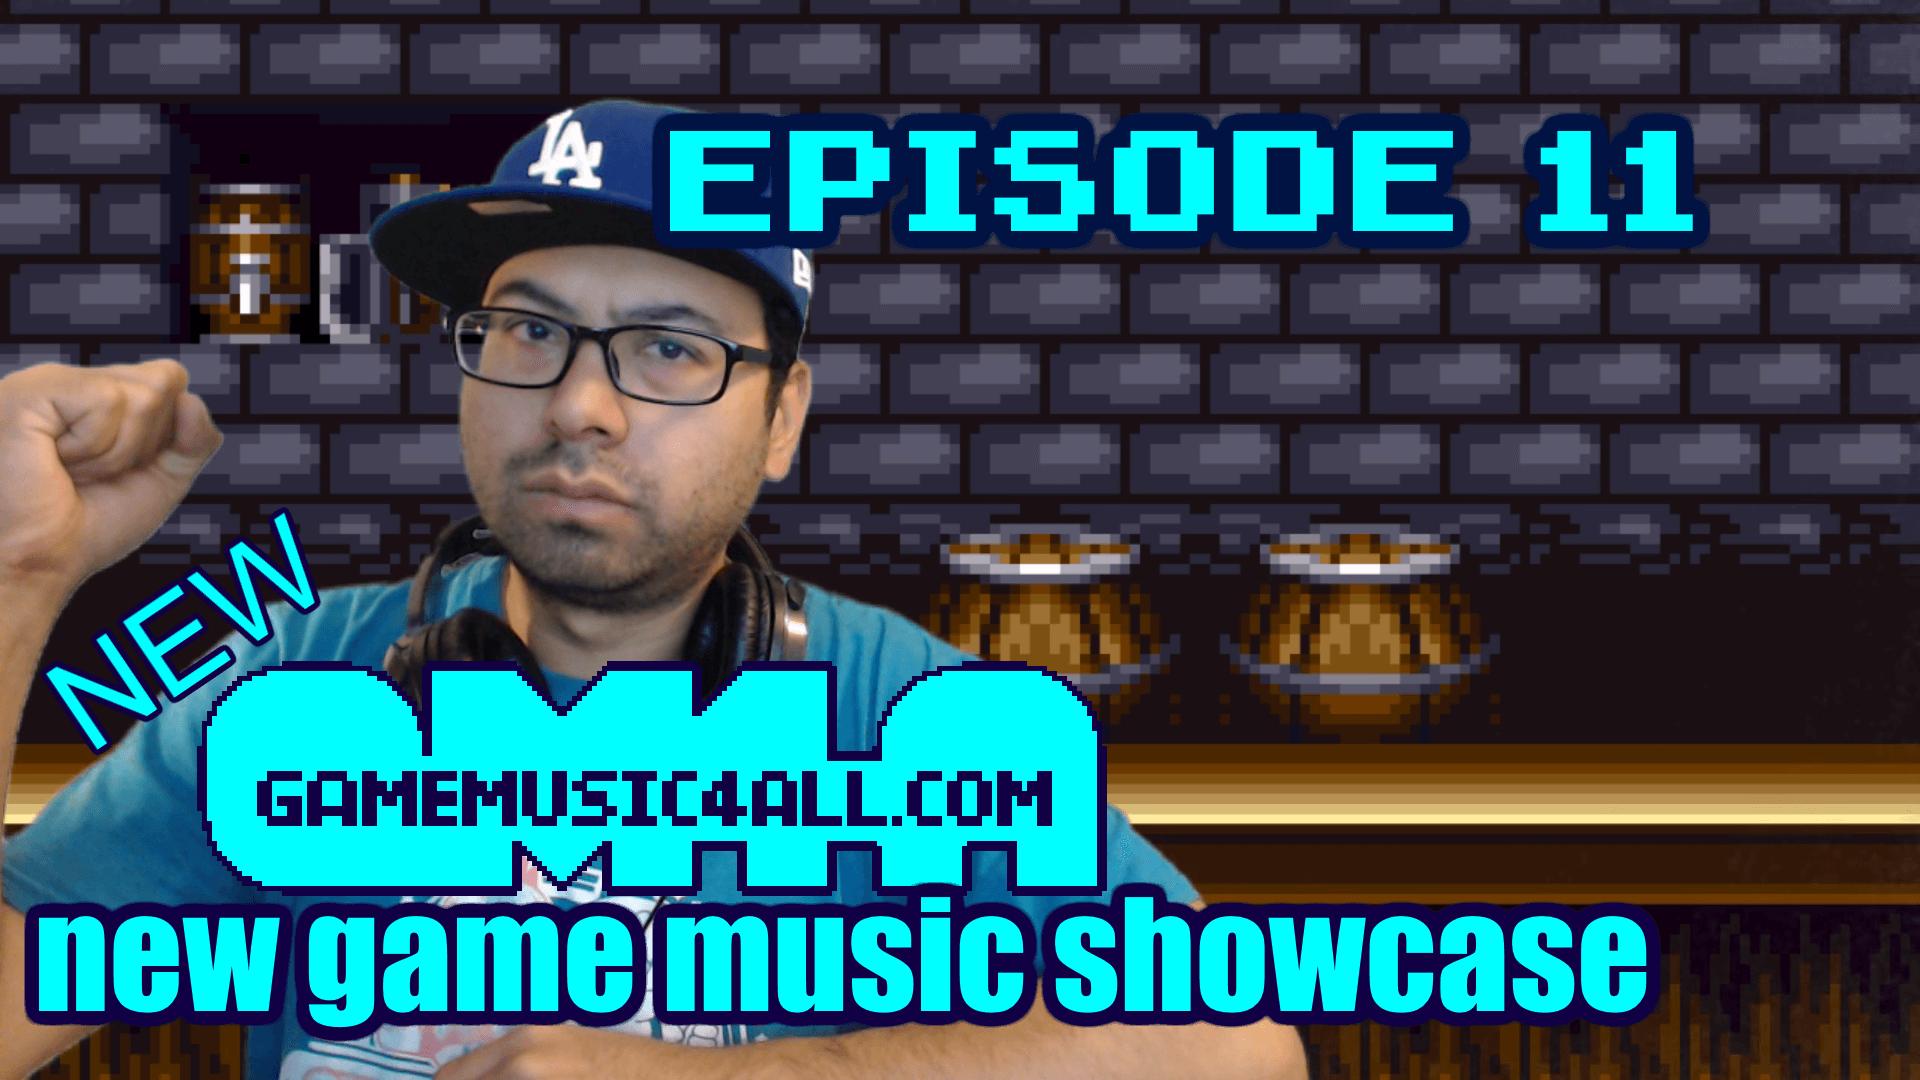 newgamemusicshowcase11.png